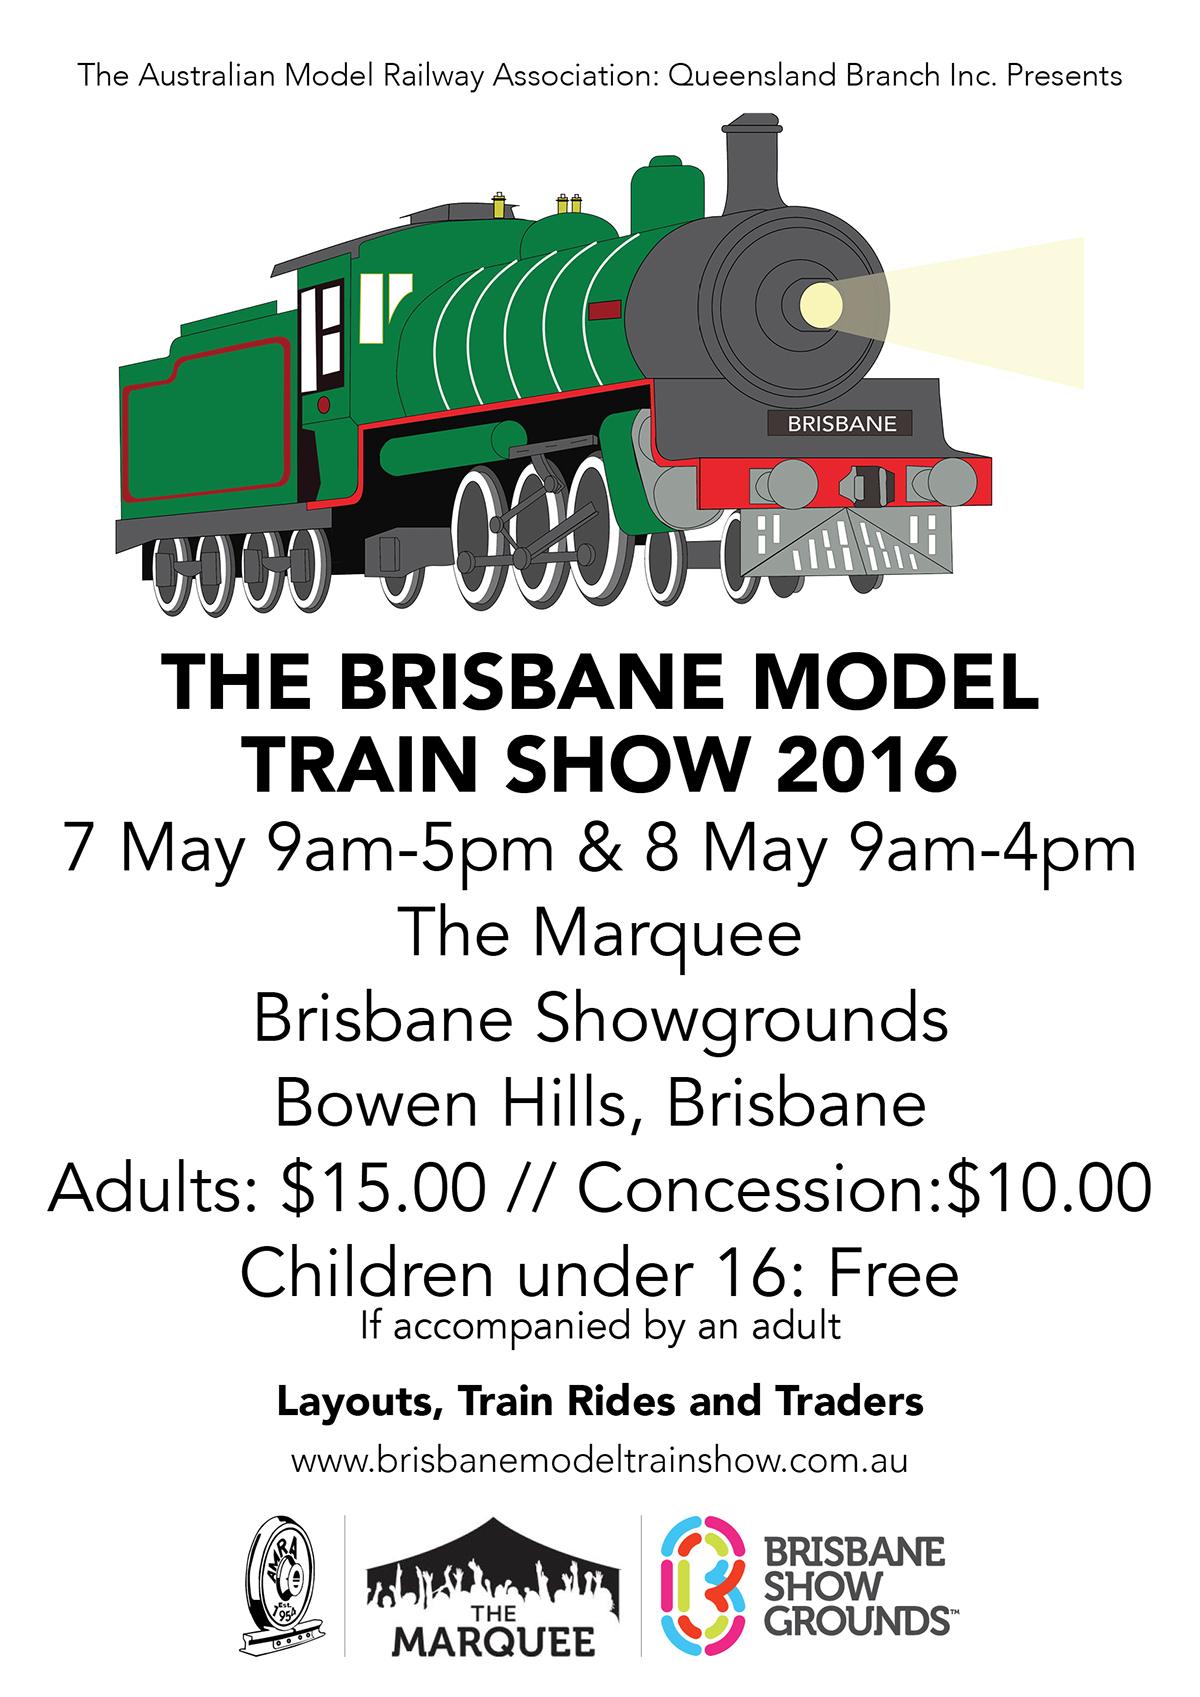 Brisbane Model Train Show 2016 on Behance